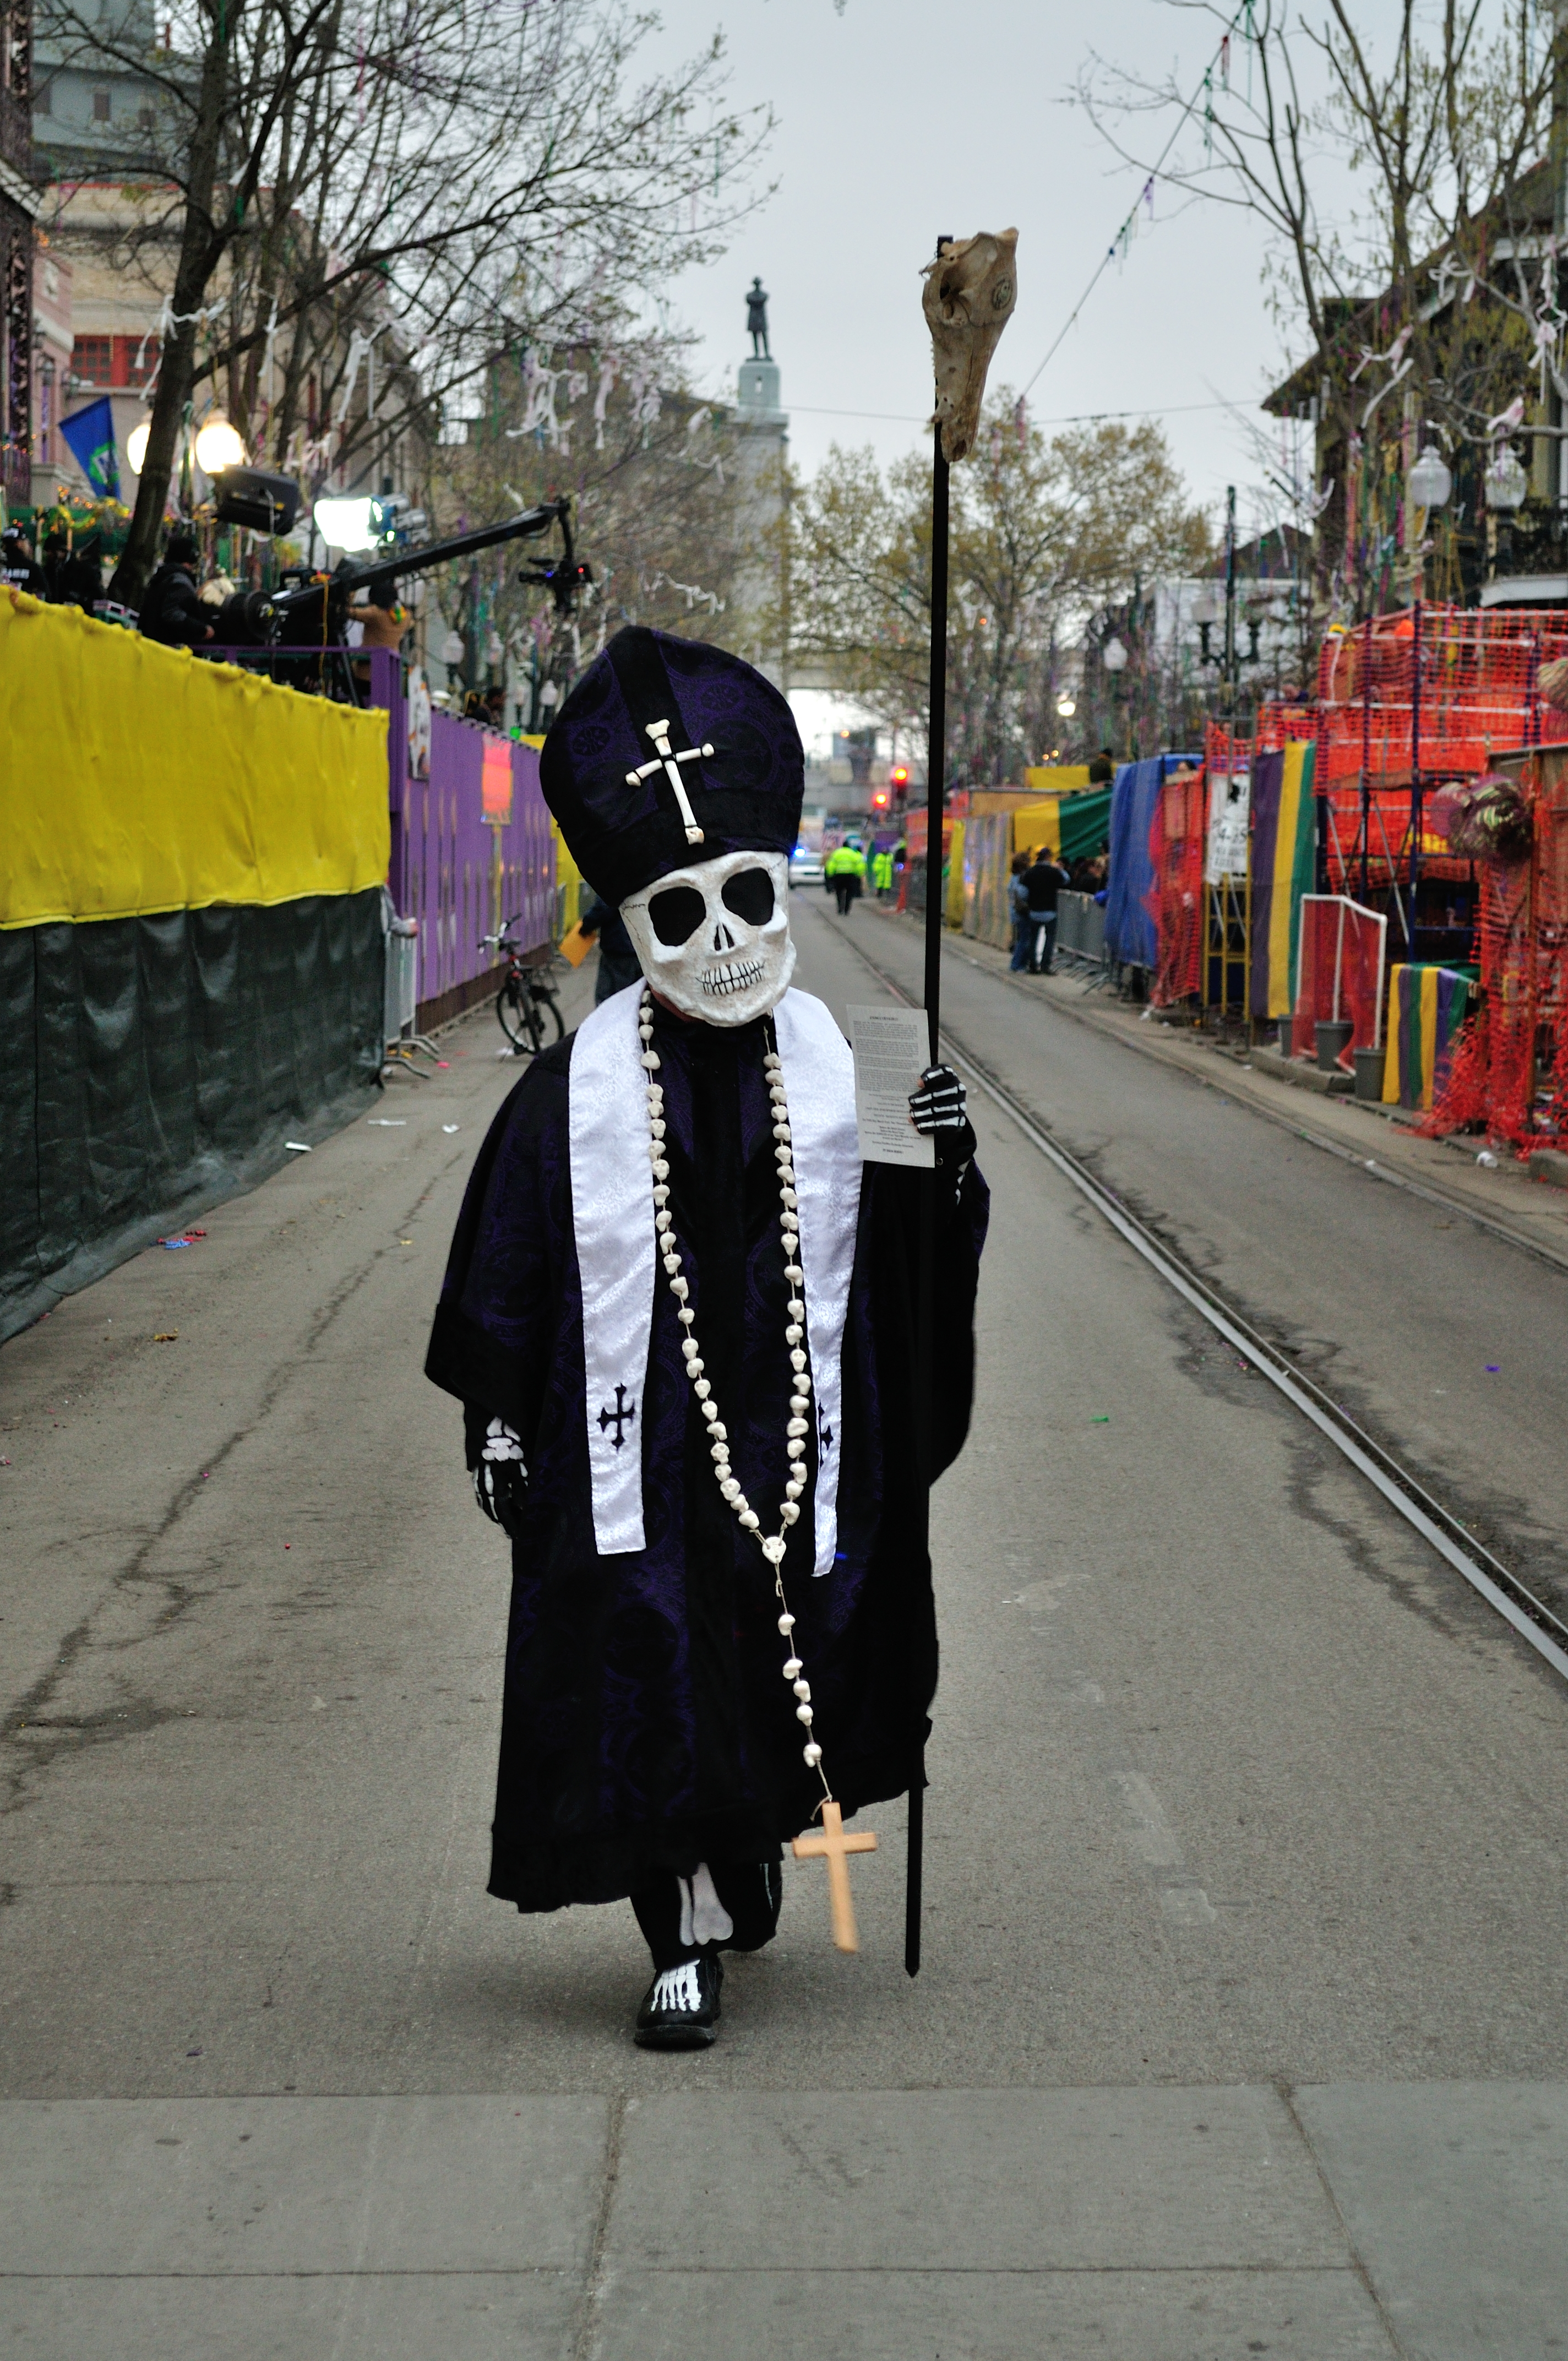 mardi gras day 2014